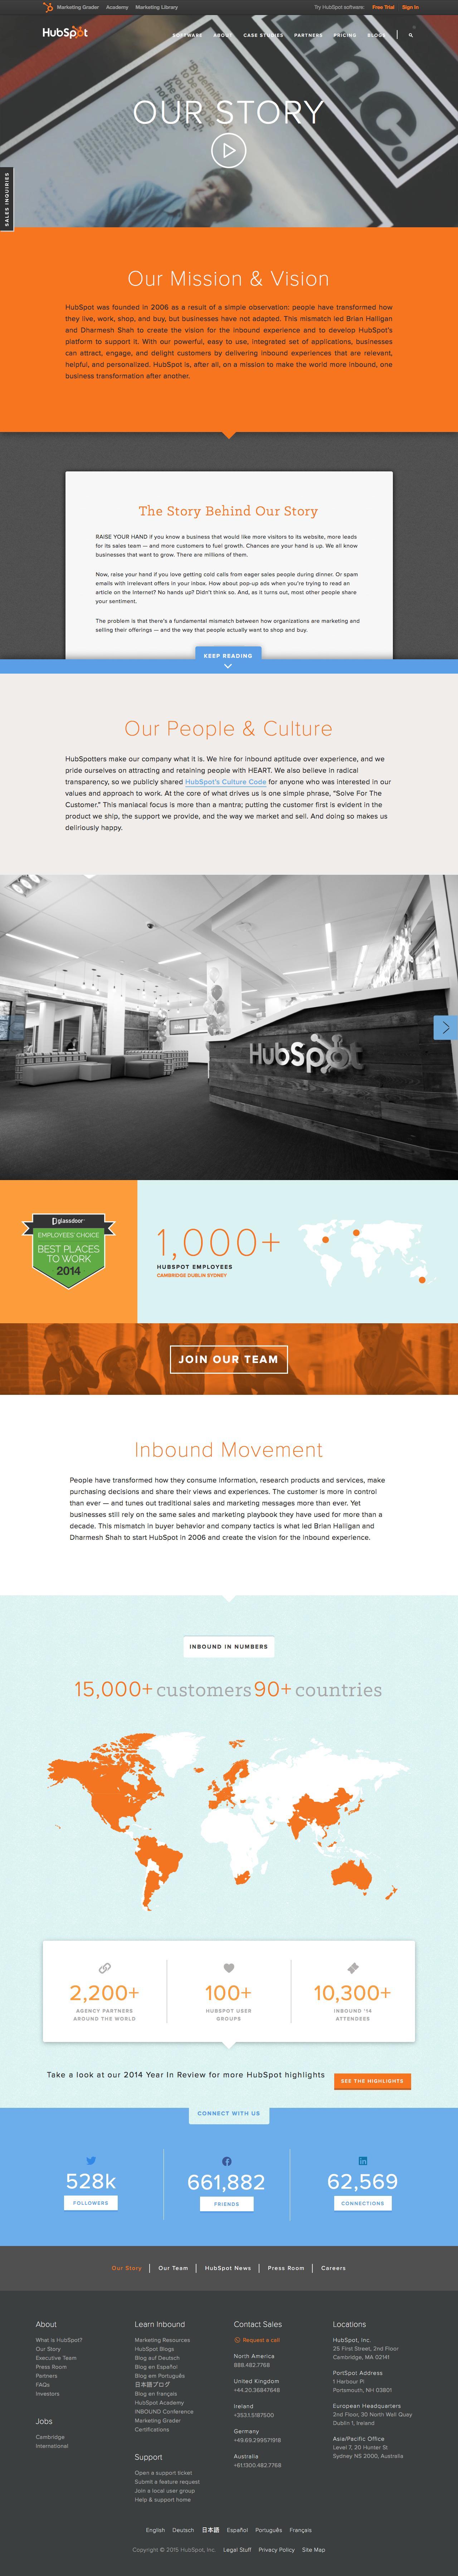 Screenshot of hubspot.com - About HubSpot - Internet Marketing Company - captured Nov. 2, 2015